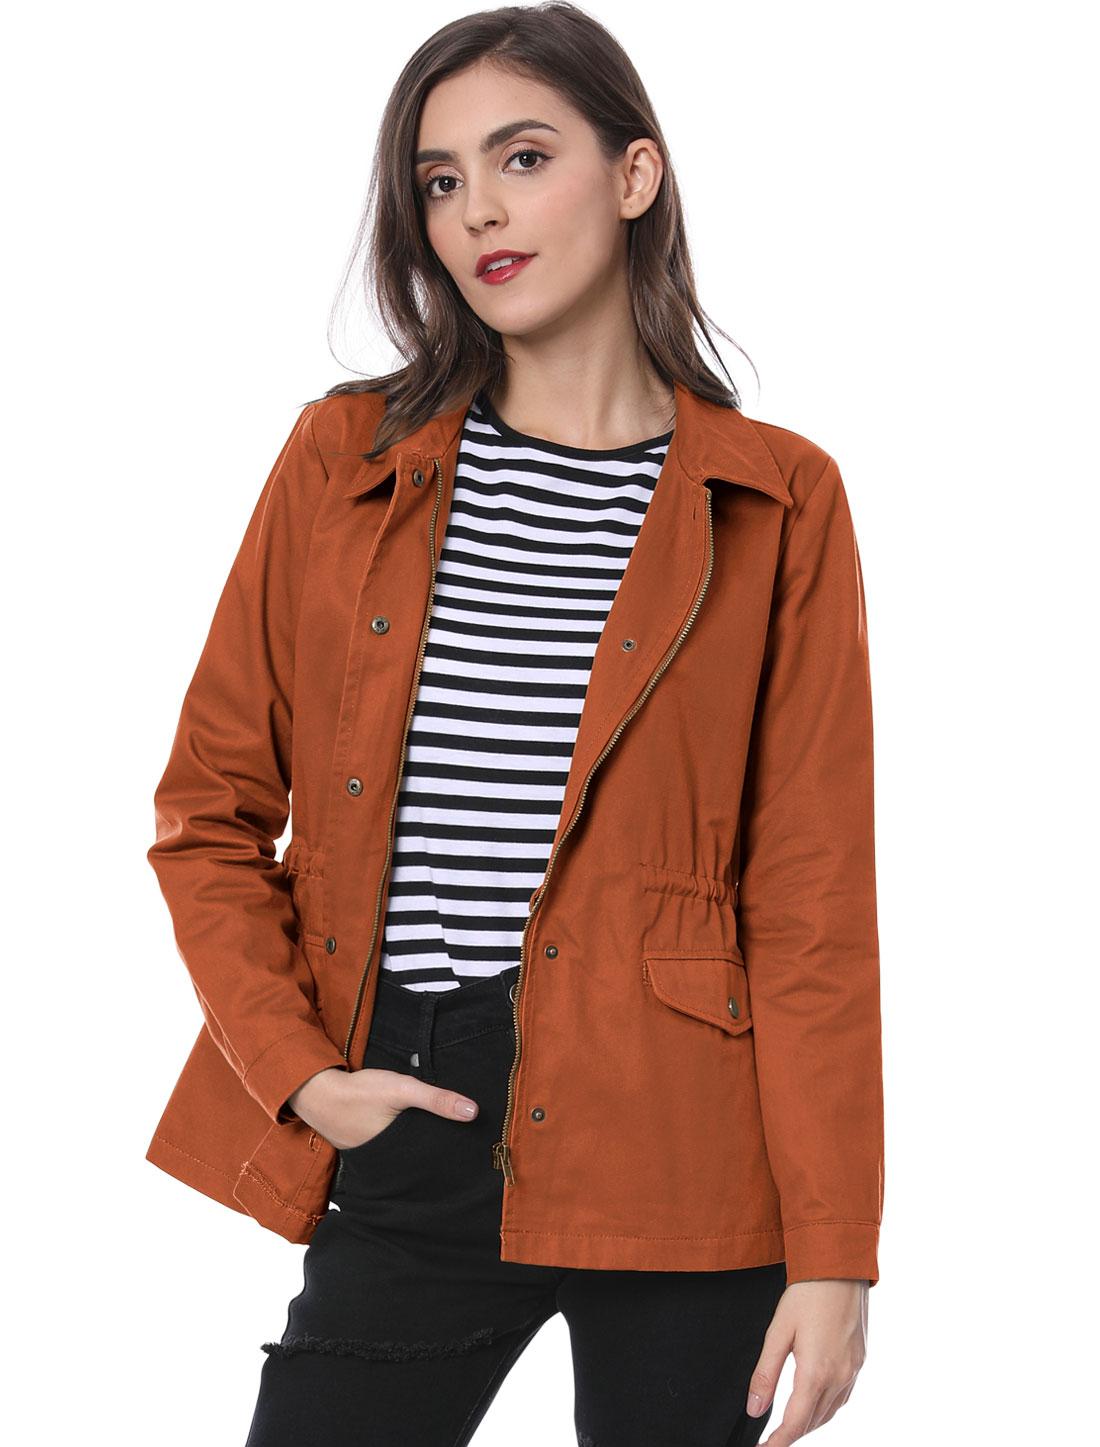 Women's Drawstring Waist Flap Pockets Lightweight Utility Jacket Burnt Orange M